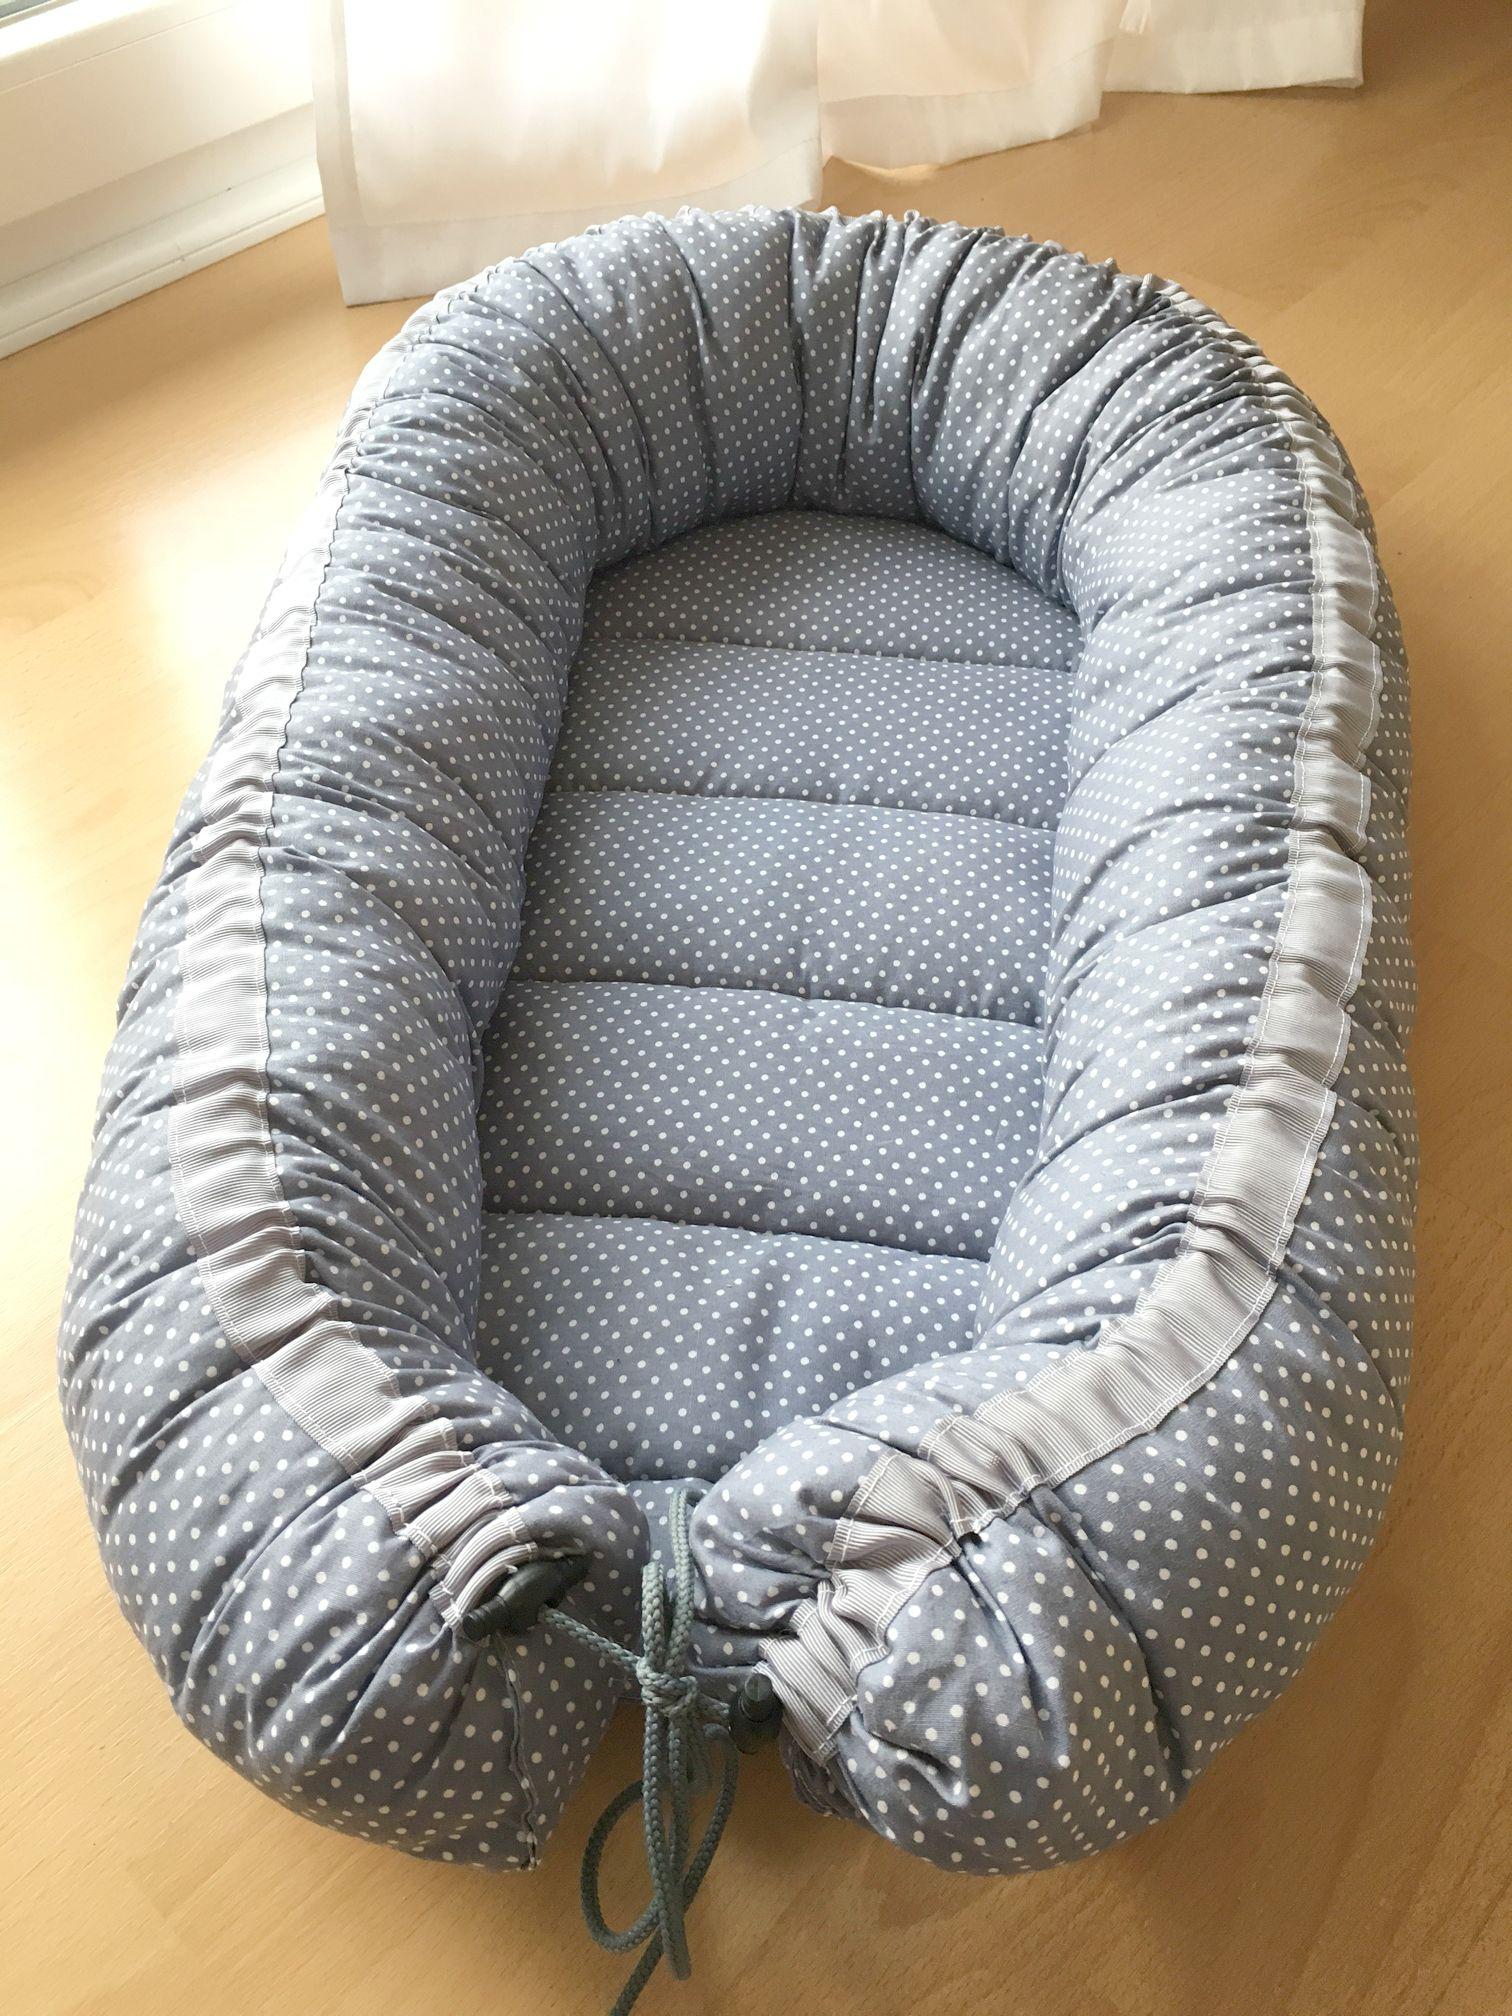 how to sew a babynest wie man ein babynest n ht. Black Bedroom Furniture Sets. Home Design Ideas